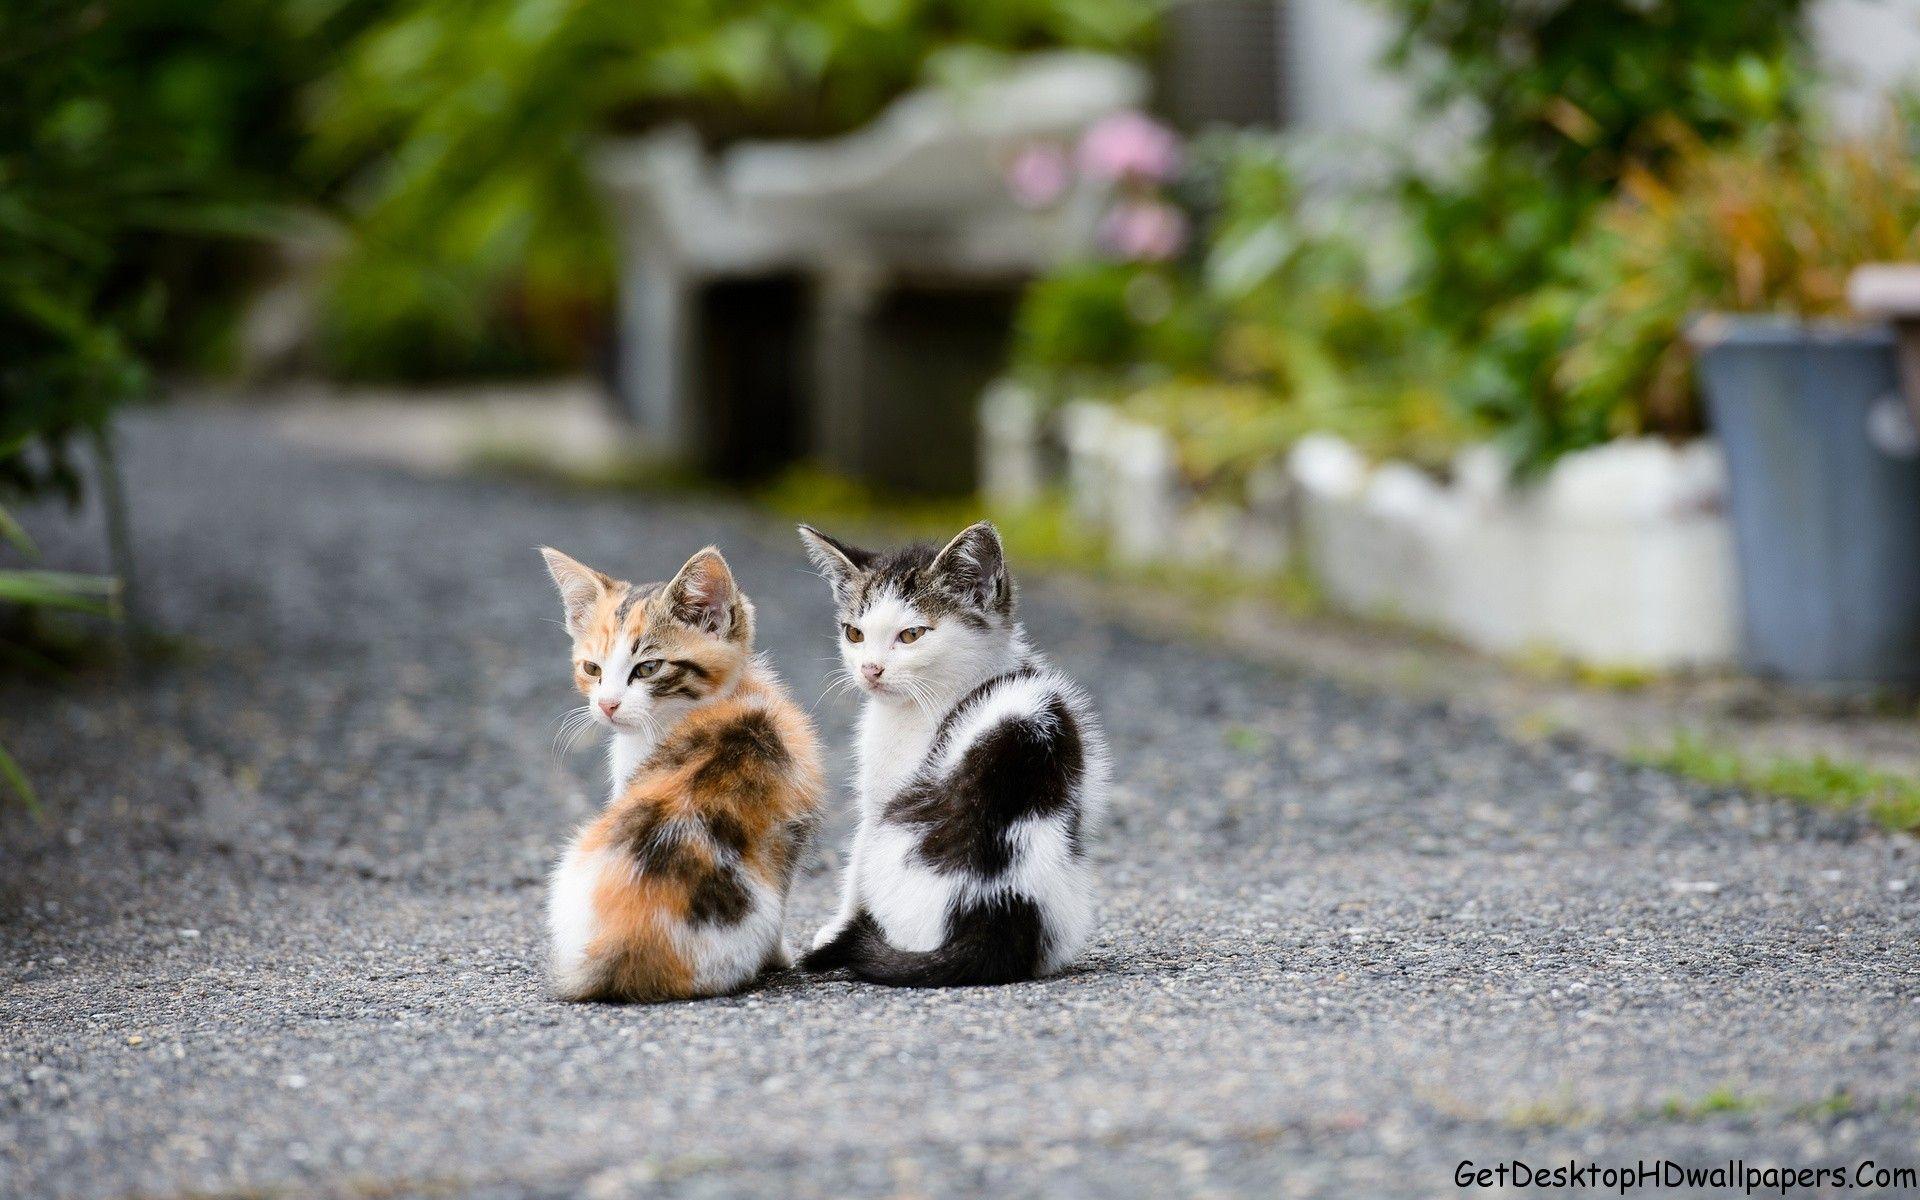 Hd Computer Animal Wallpaper Twins Cat Birds Animals Hd Wallpapers Desktop Hd Wallpapers 1920 X Kittens Cutest Beautiful Cats Cute Cats